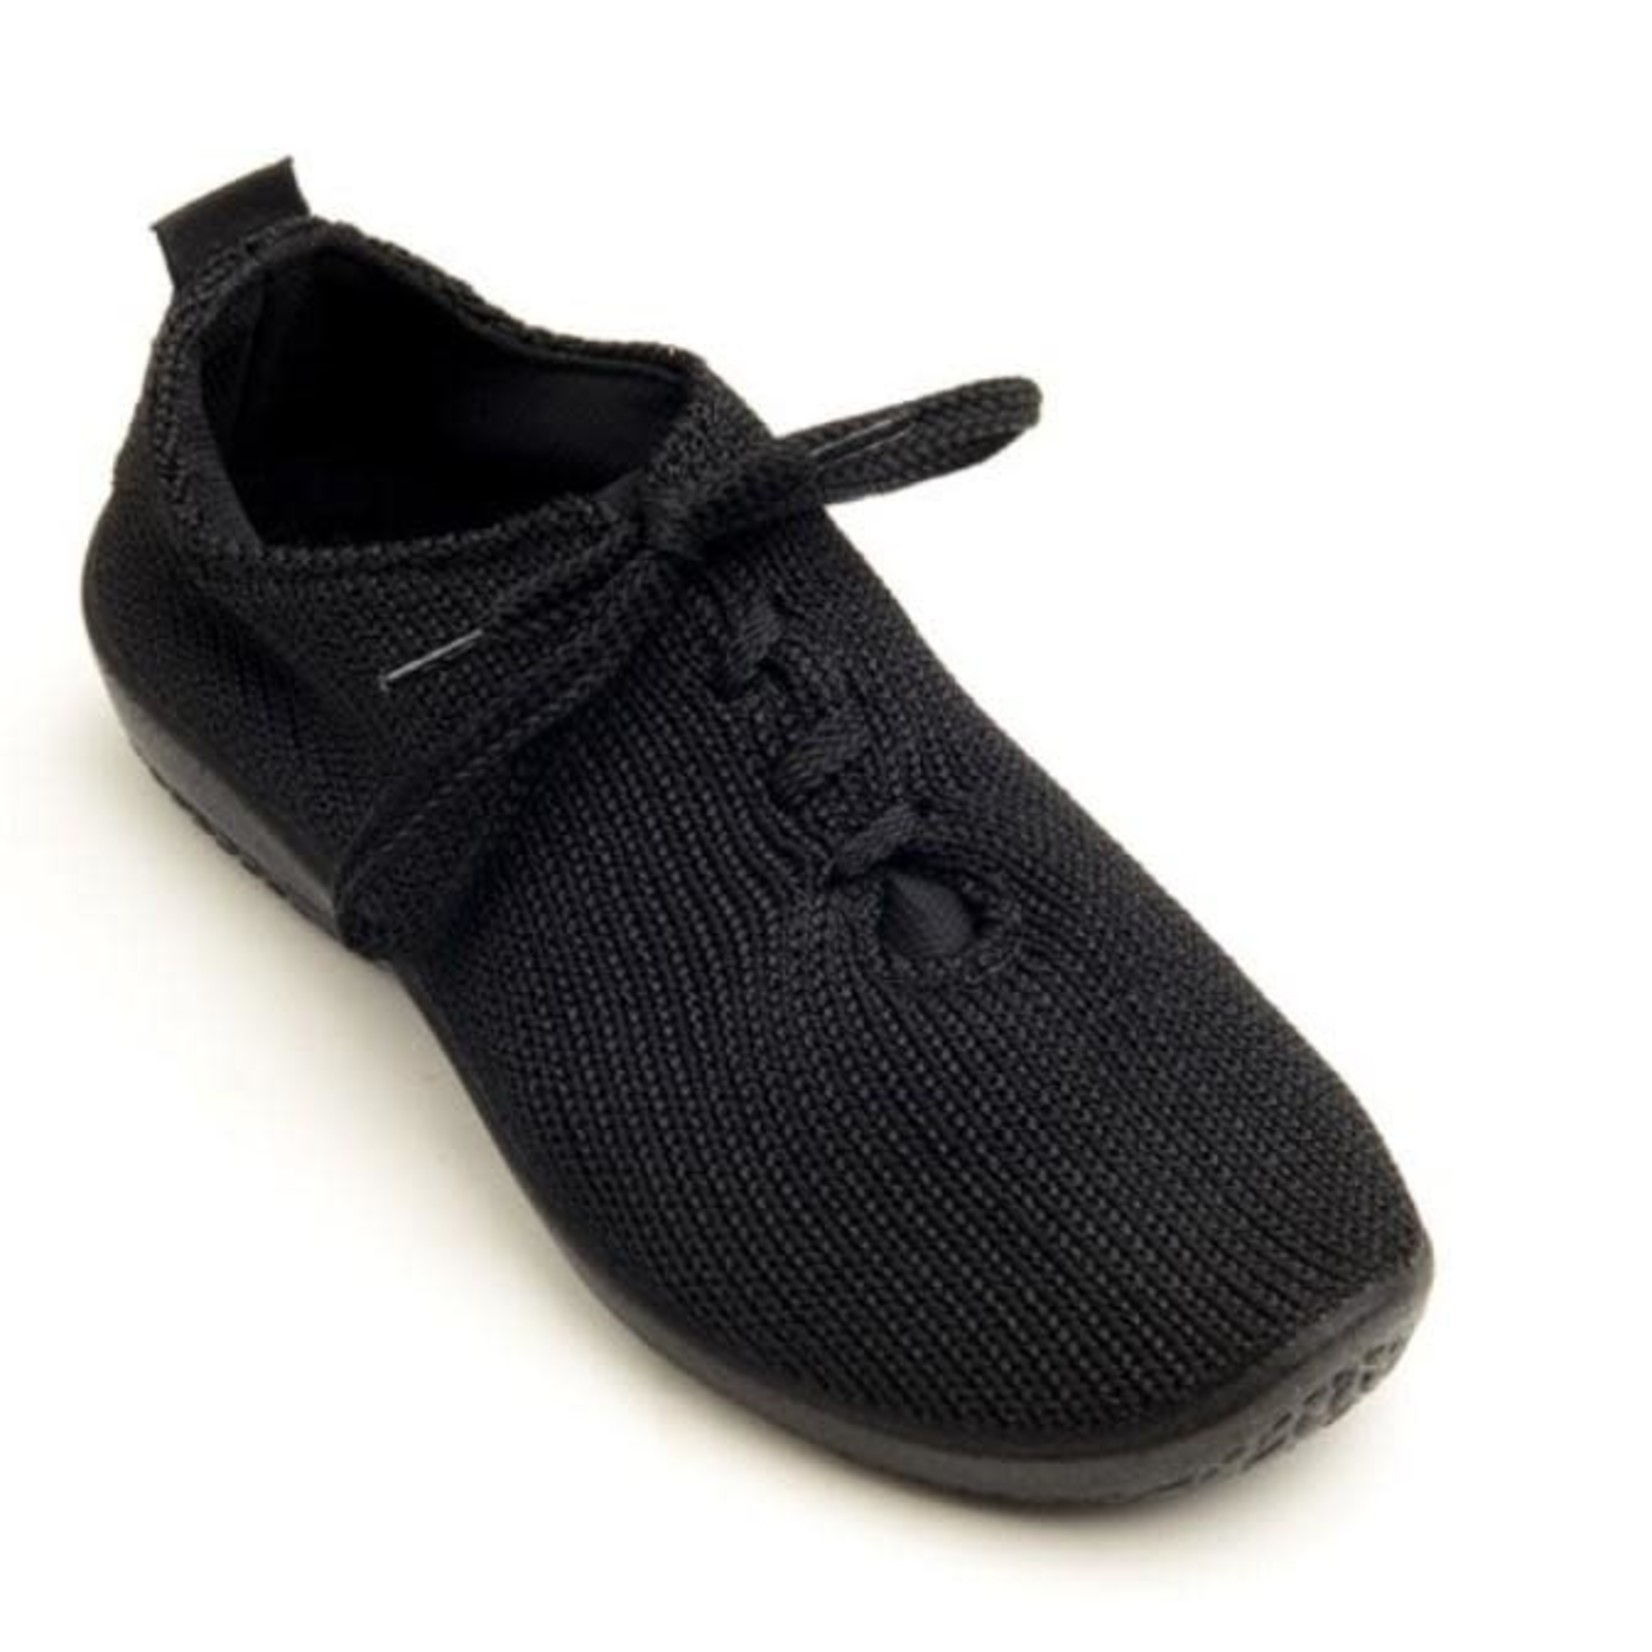 Arcopedico Arcopedico Lace Up Sneaker